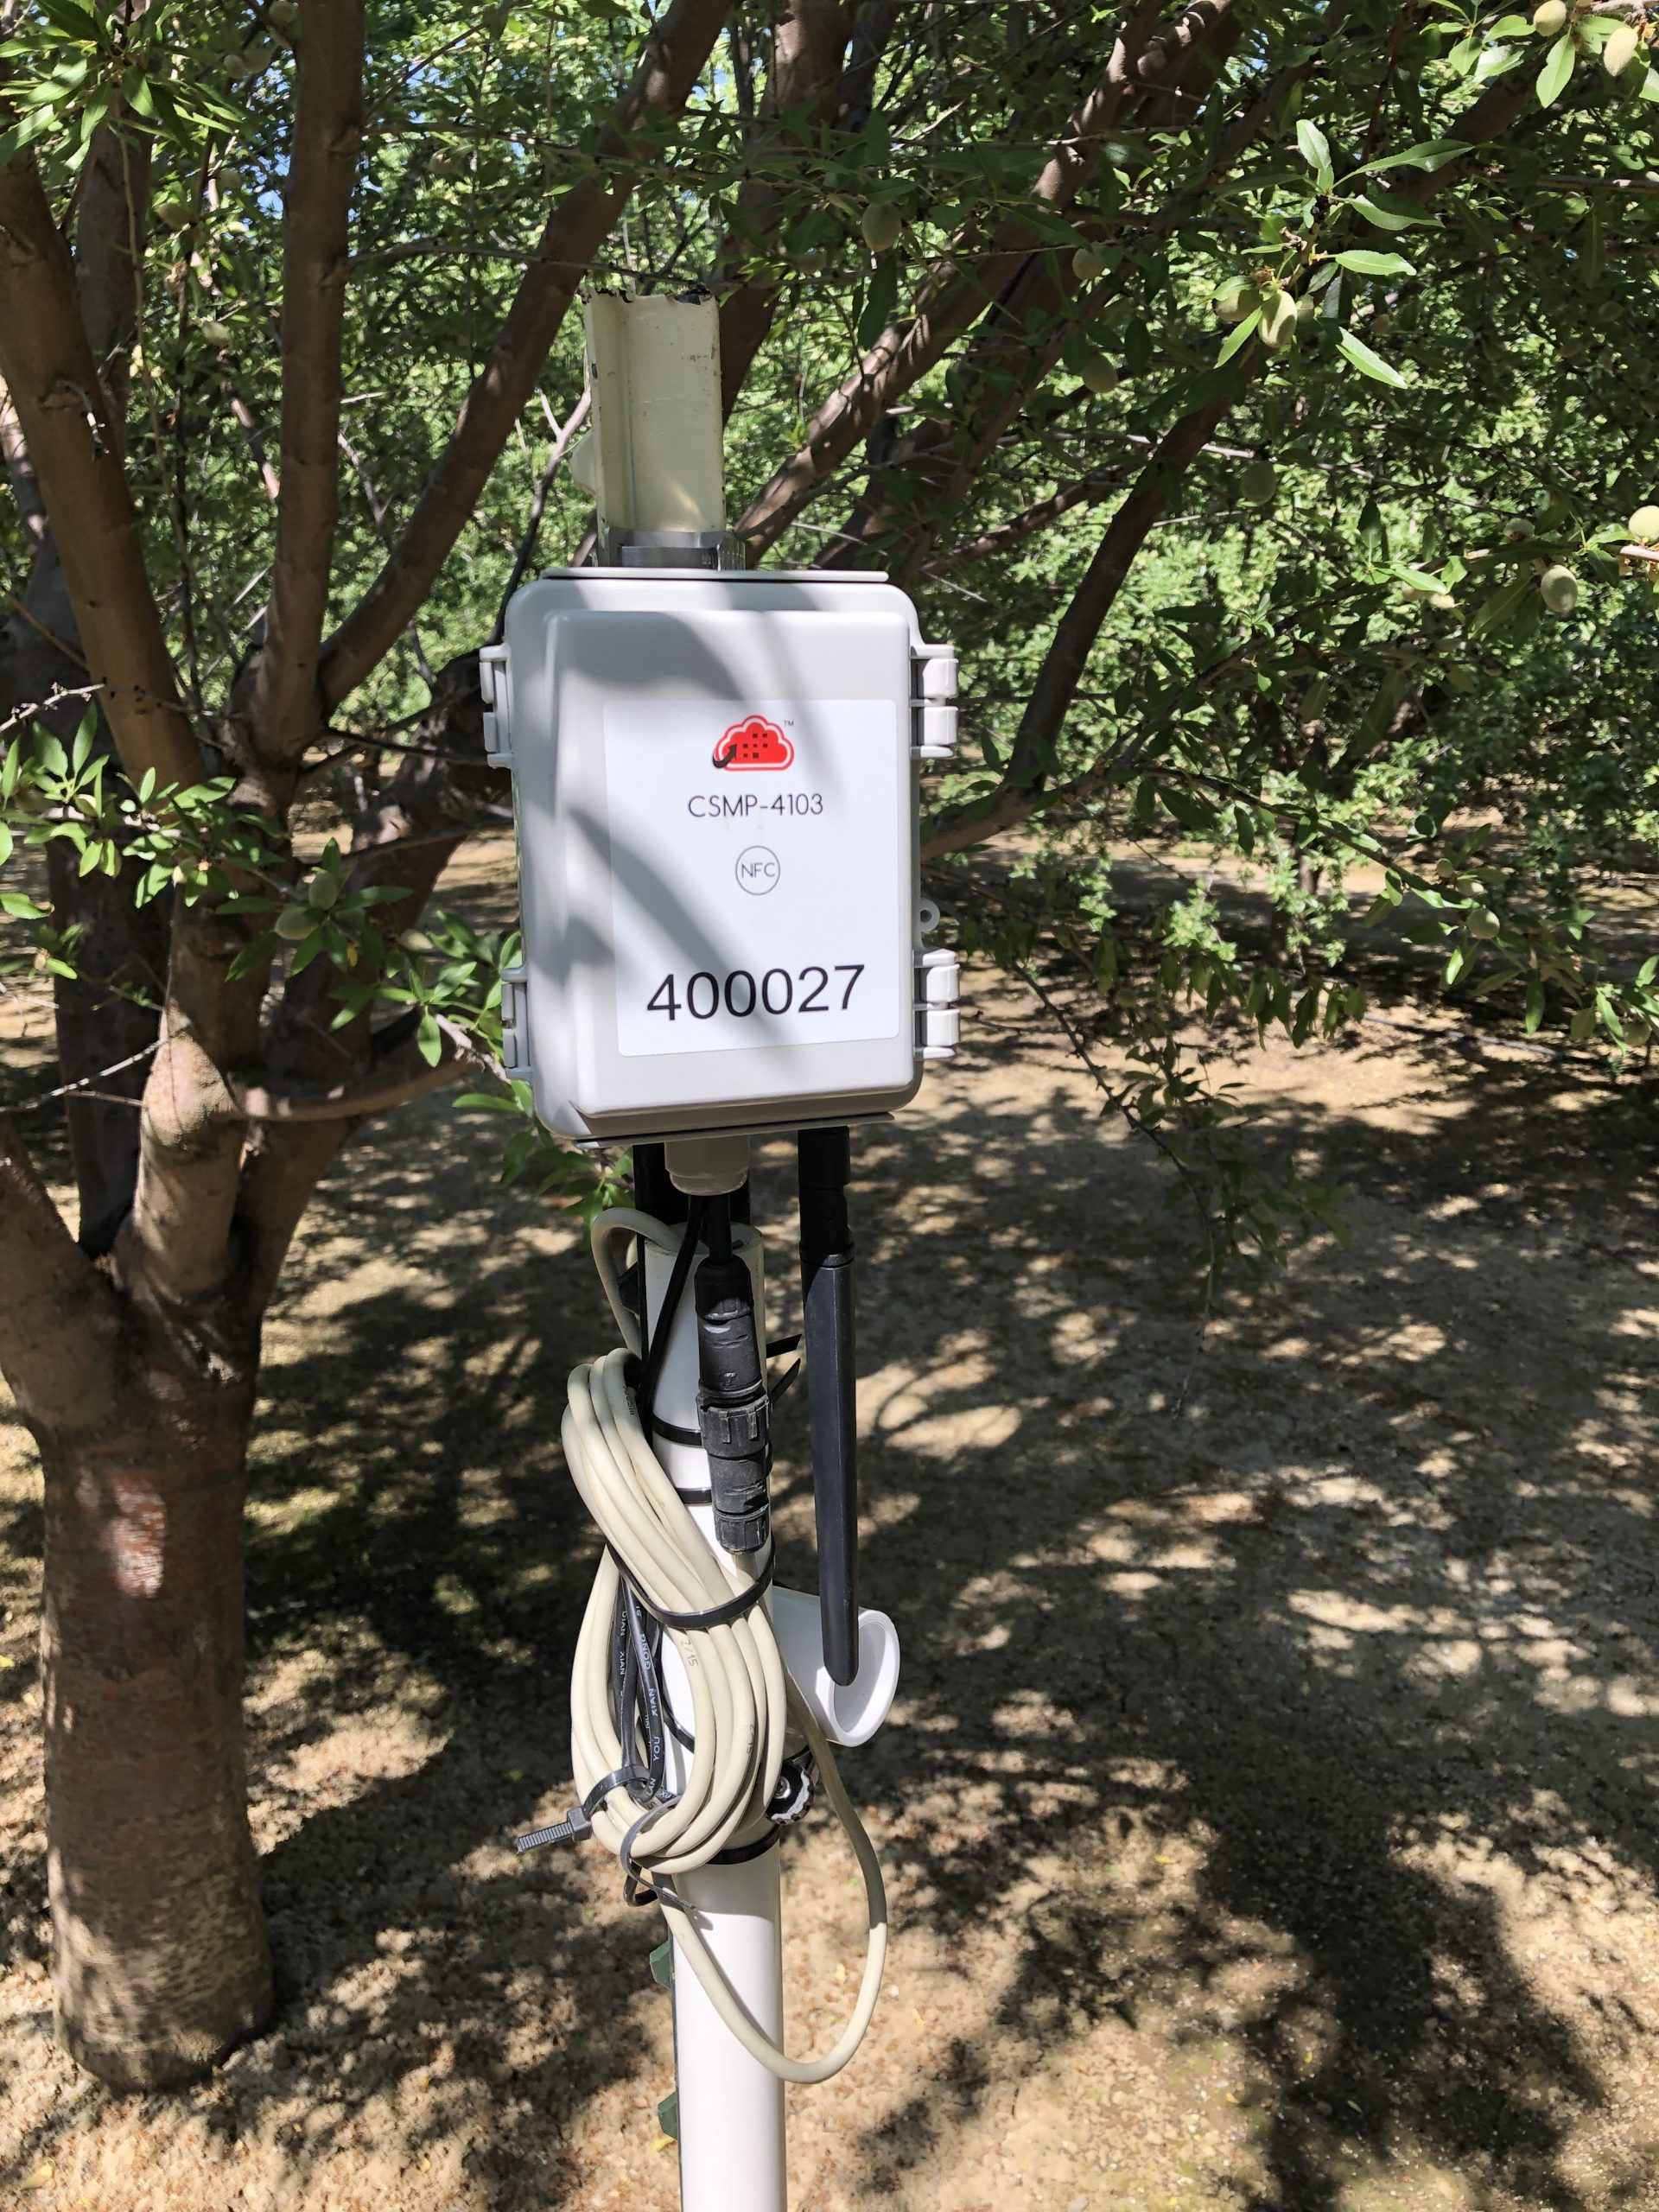 Zenseio Orchard Soil Moisture Monitoring